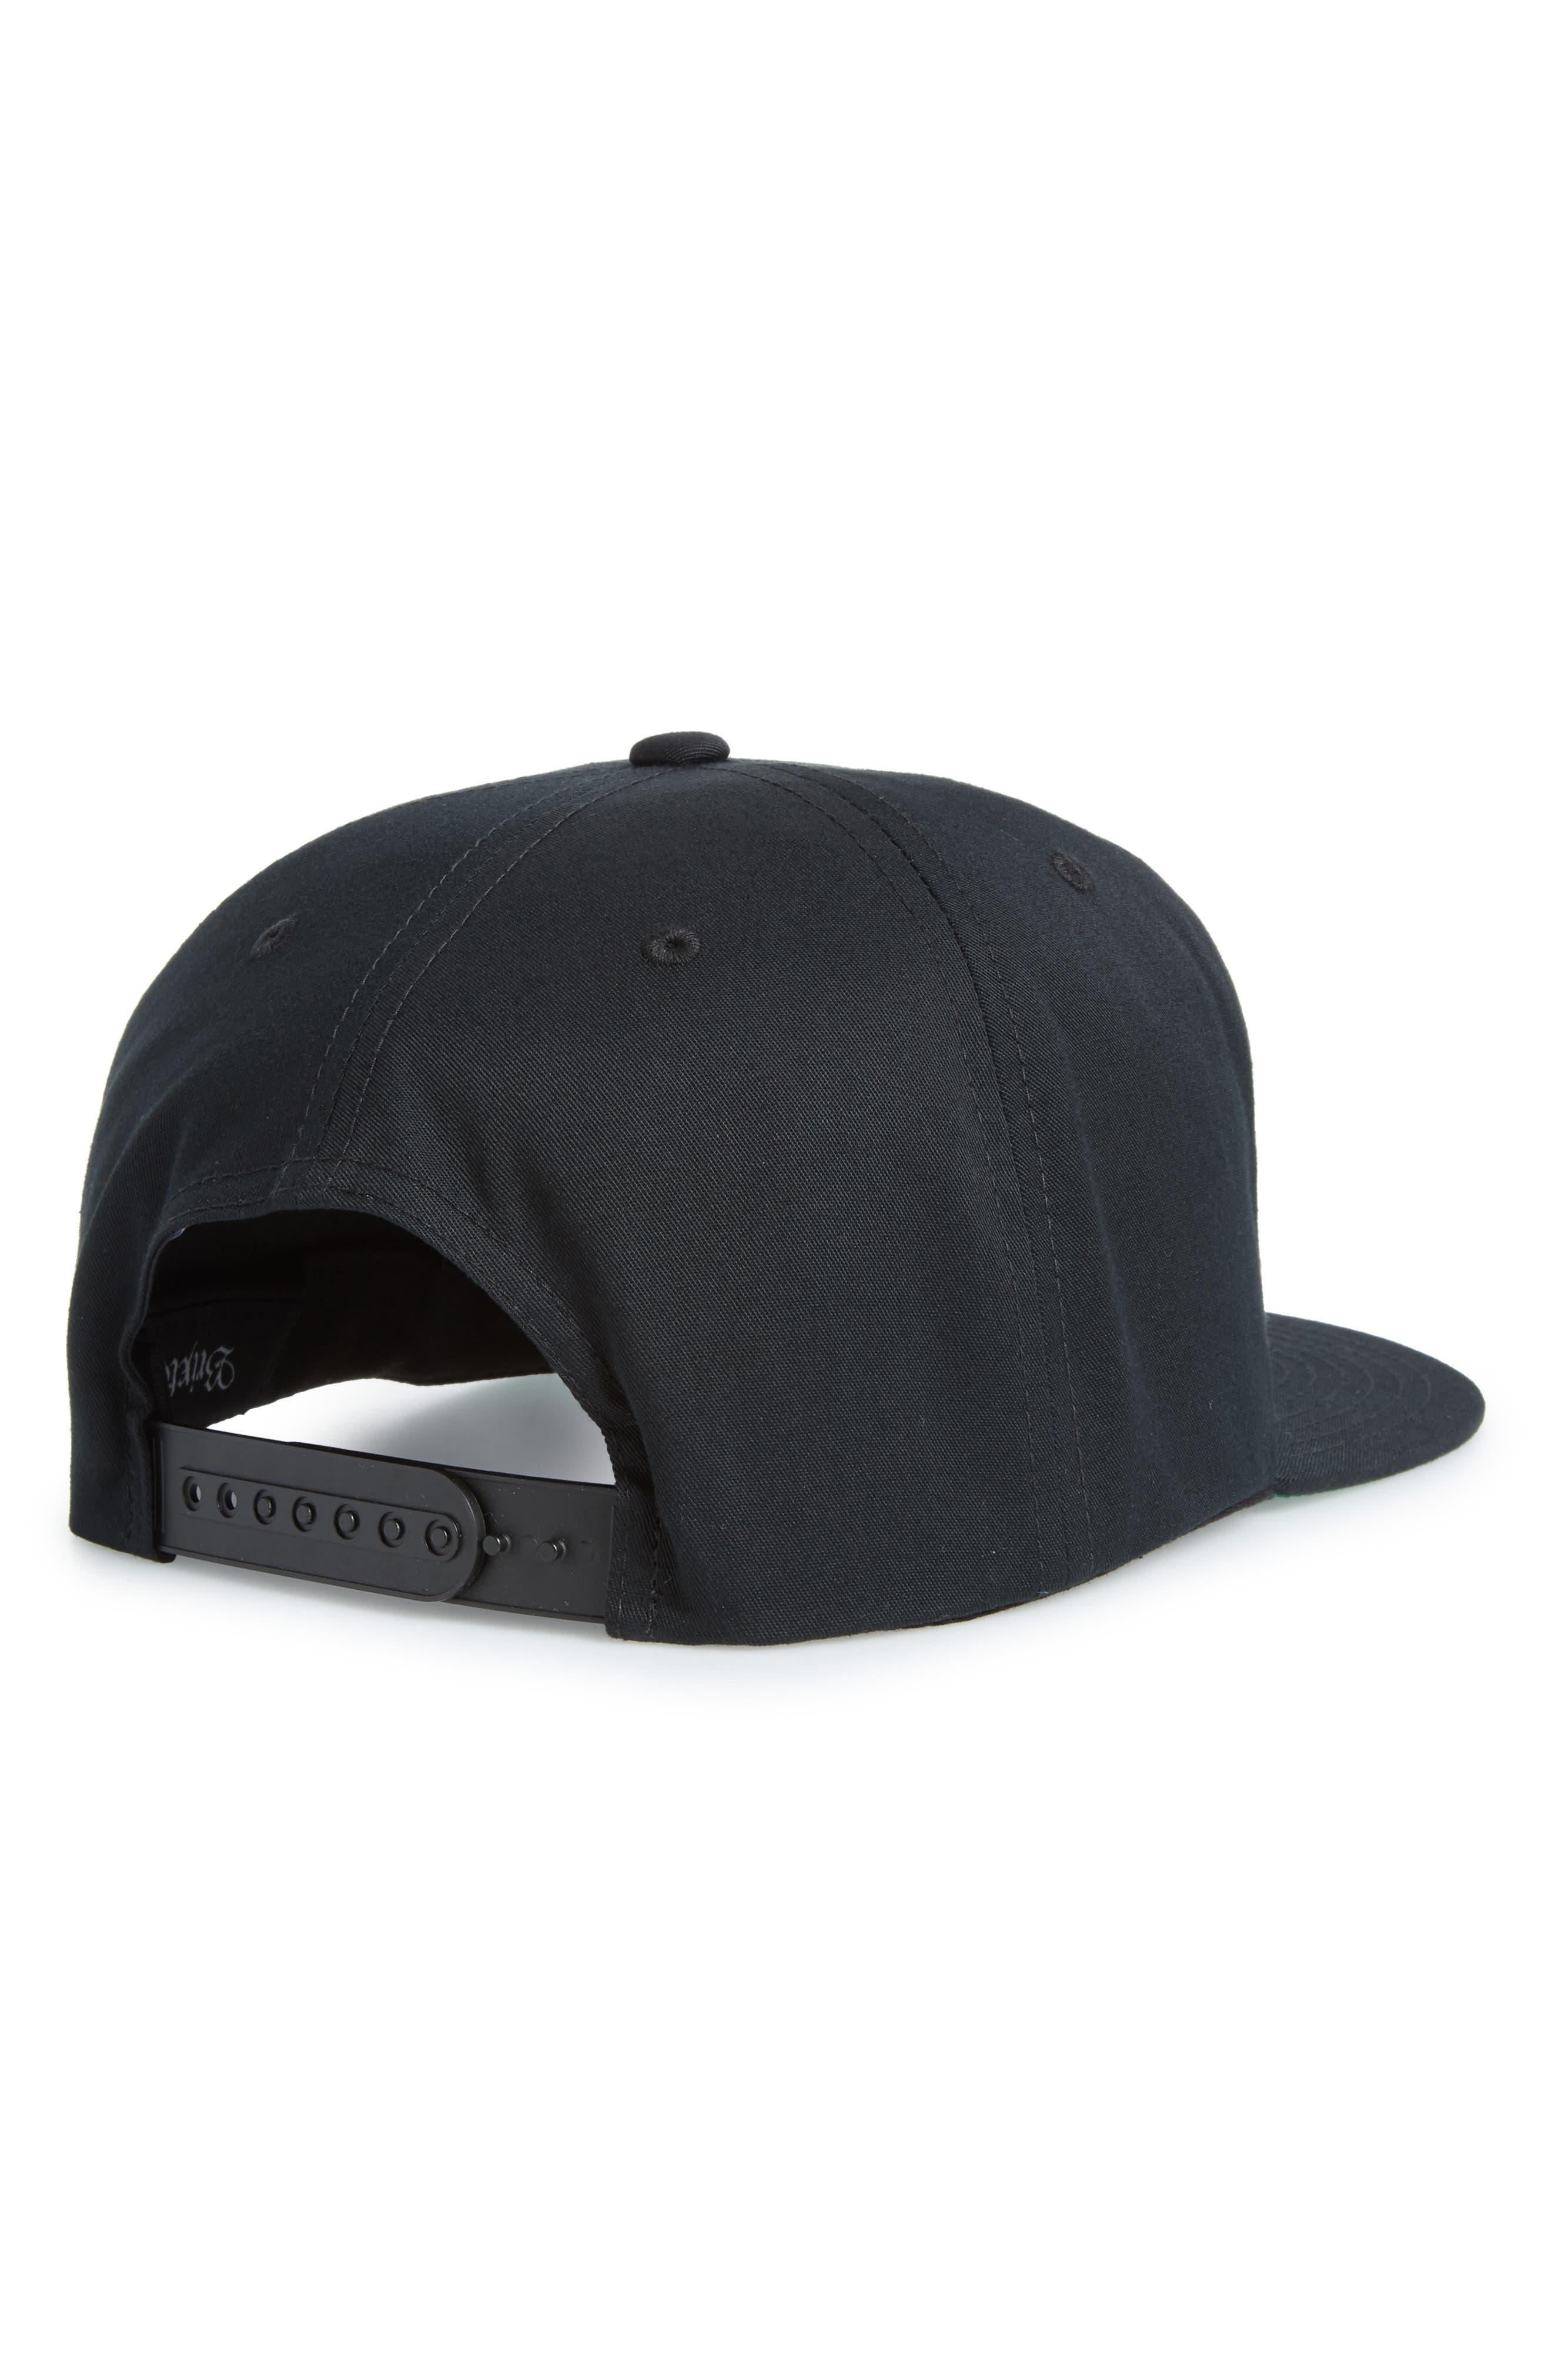 Team Ball Cap,                             Alternate thumbnail 2, color,                             Black